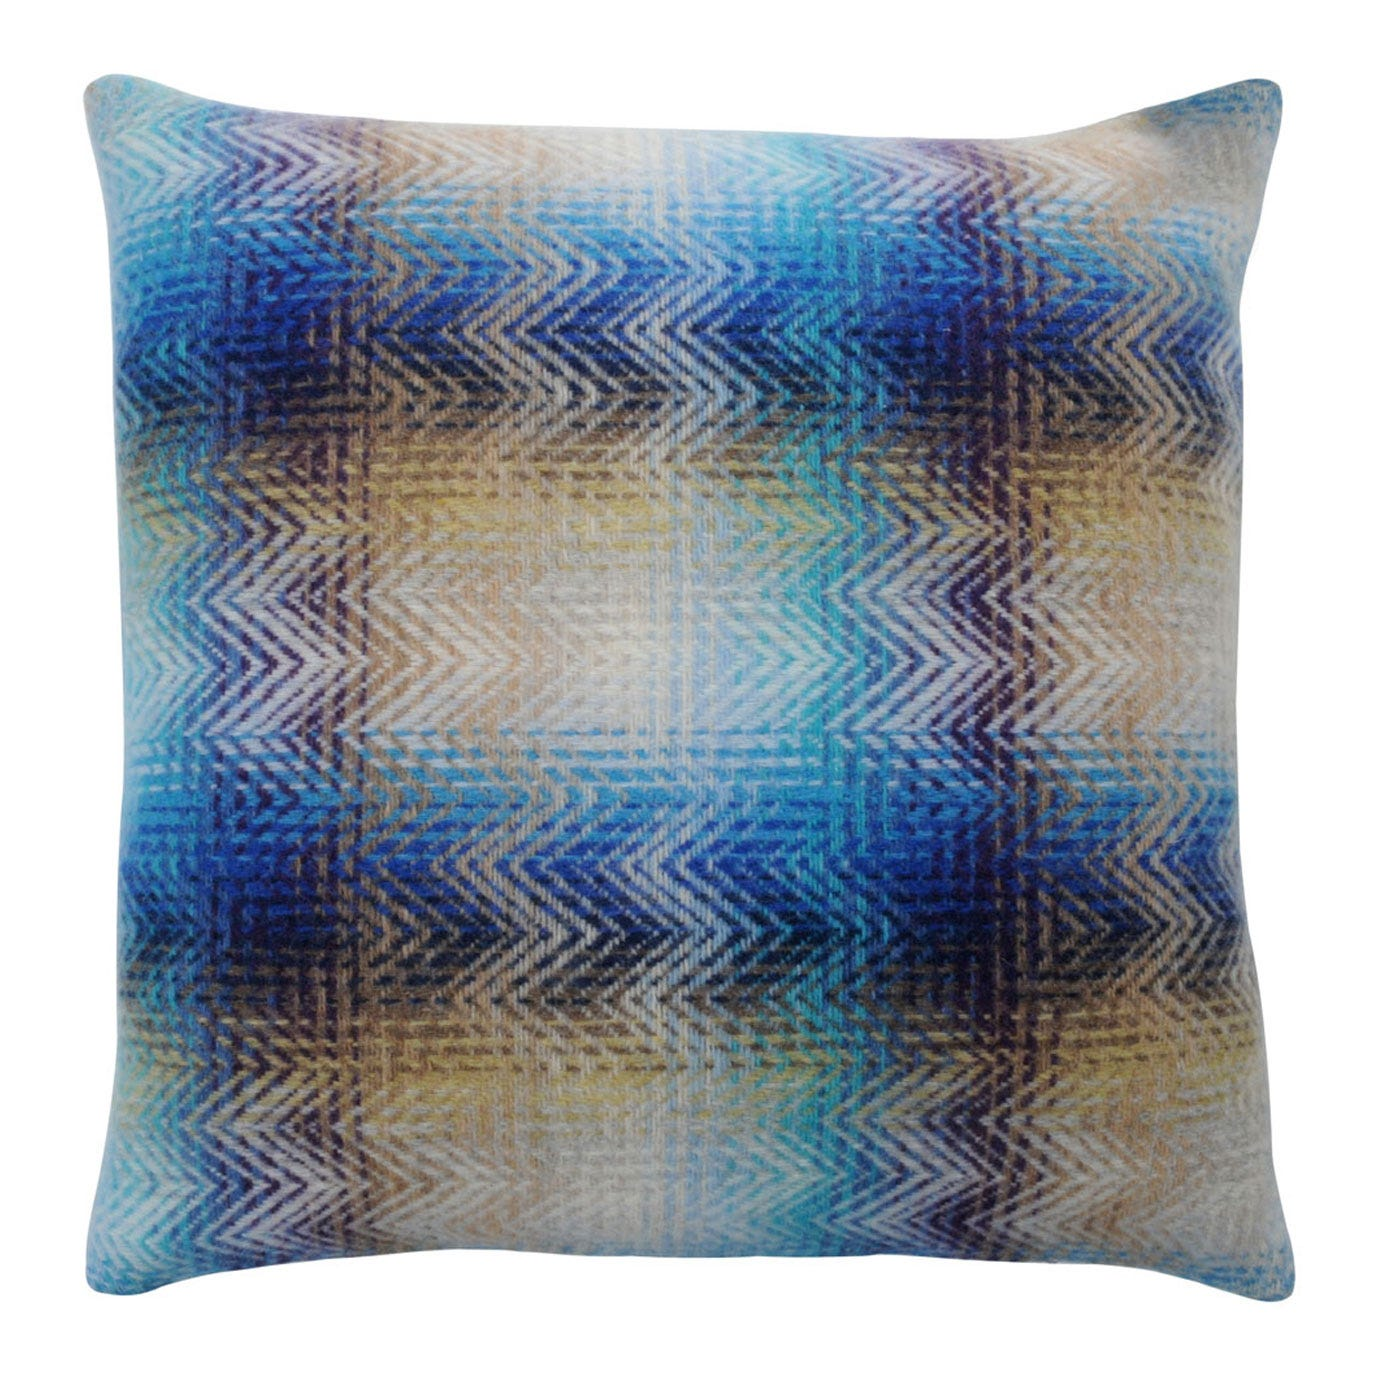 missoni home montgomery cushion - montgomery cushion  discontinued bymissoni home